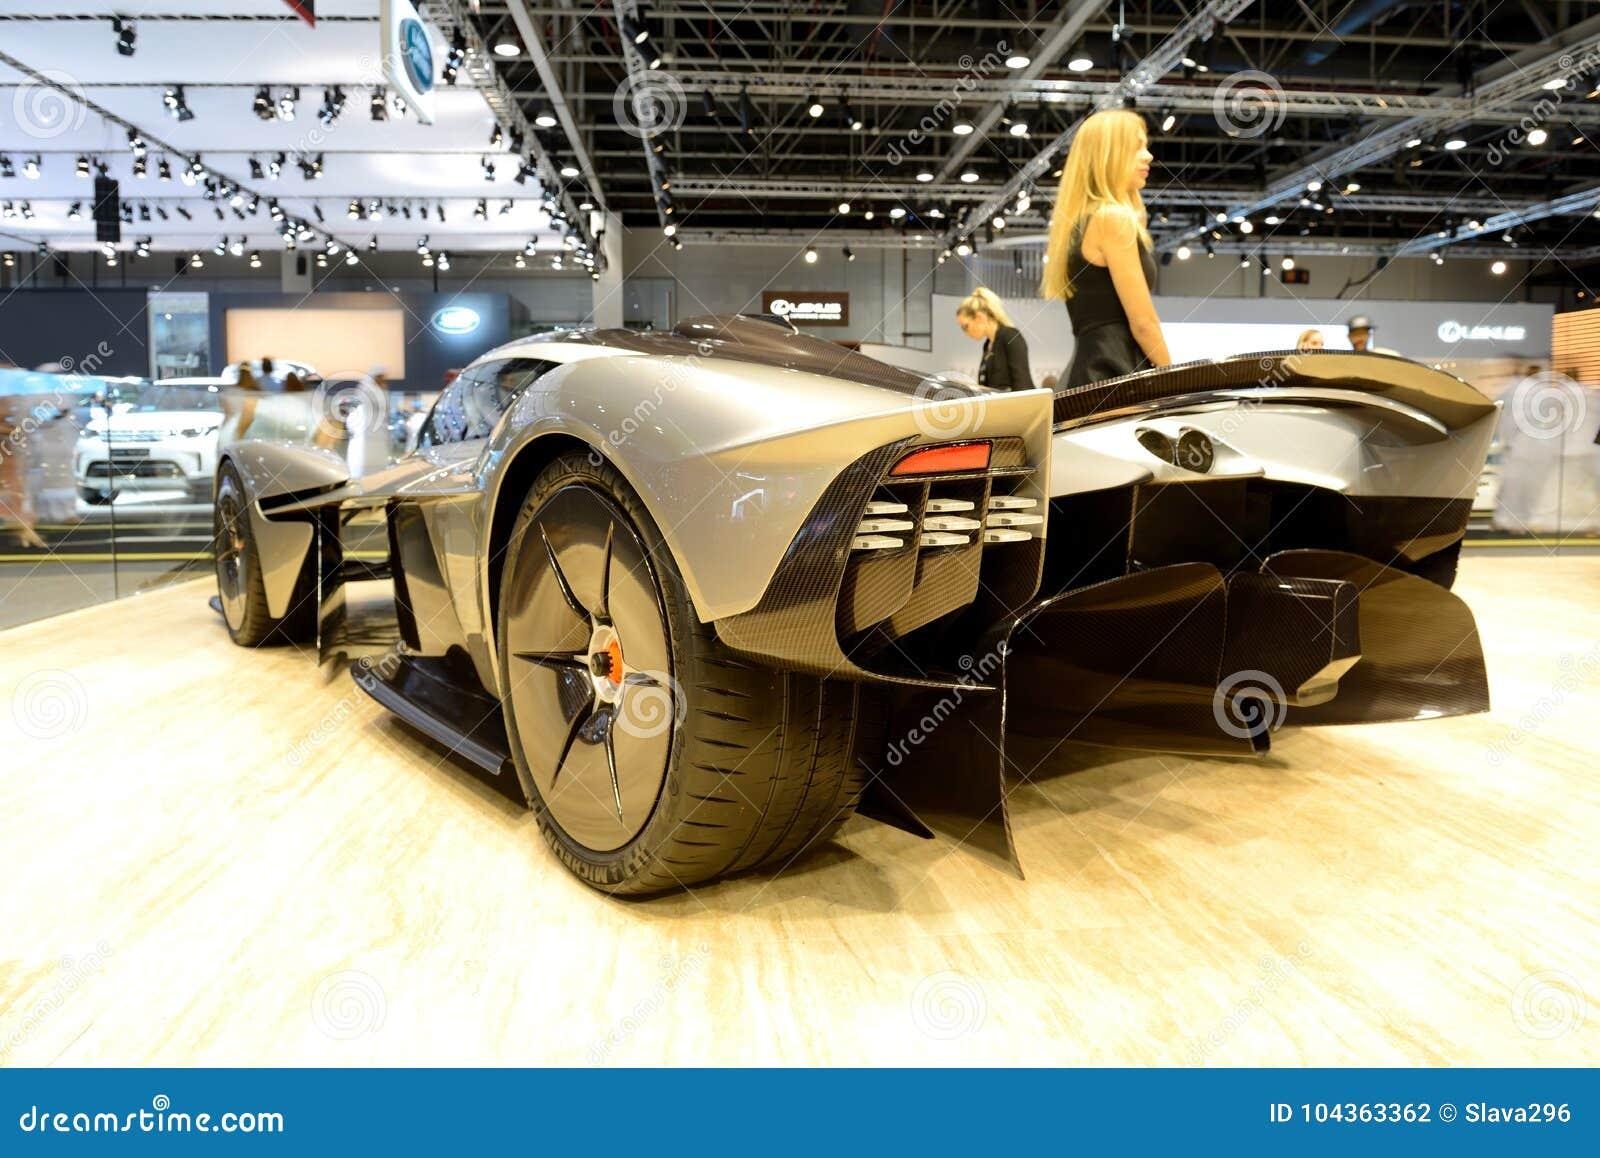 The Aston Martin Valkyrie Hybrid Electric Sports Car Is On Dubai